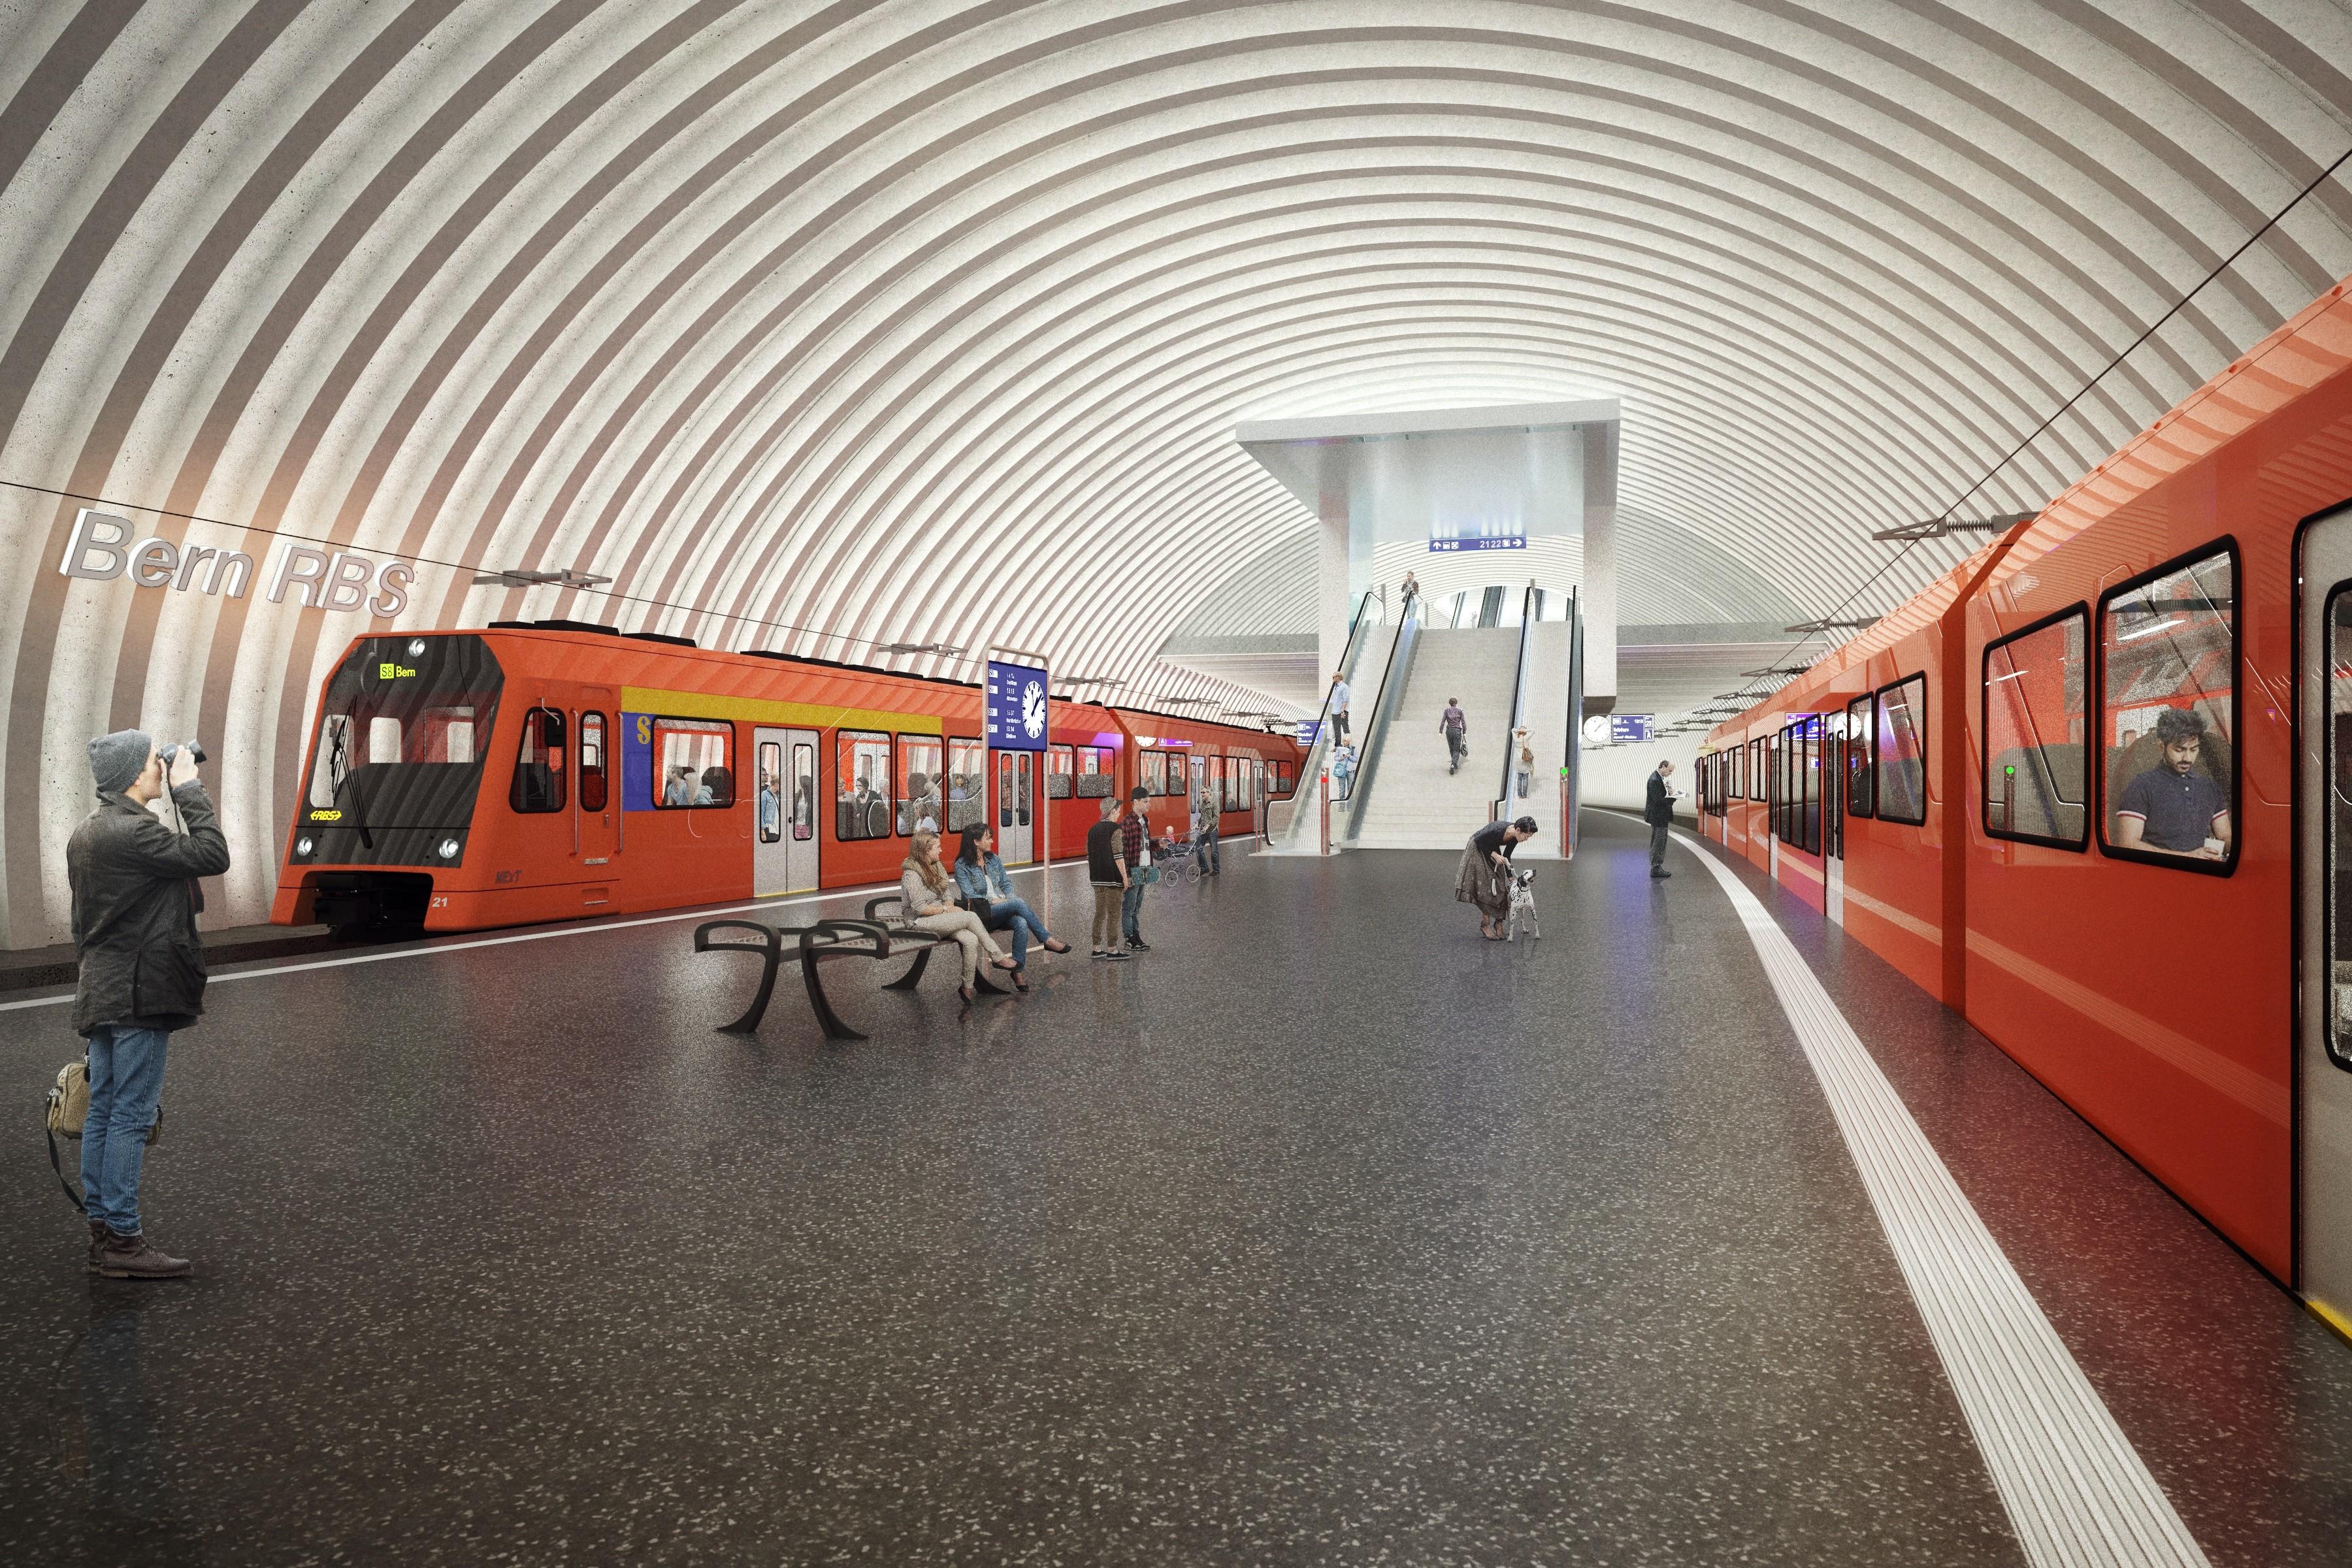 Gare de Berne 1